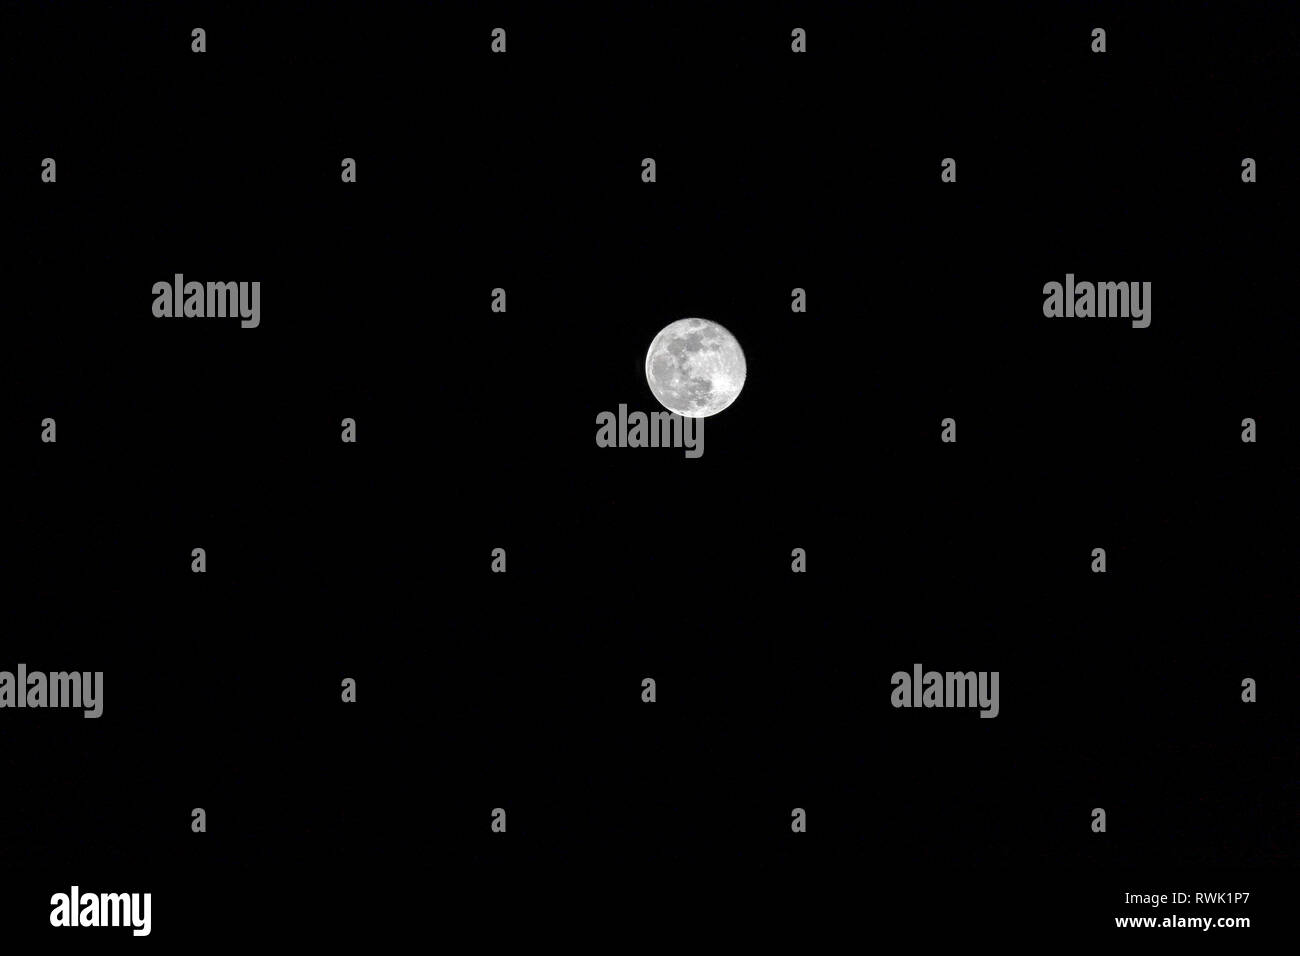 moon in the dark night RWK1P7